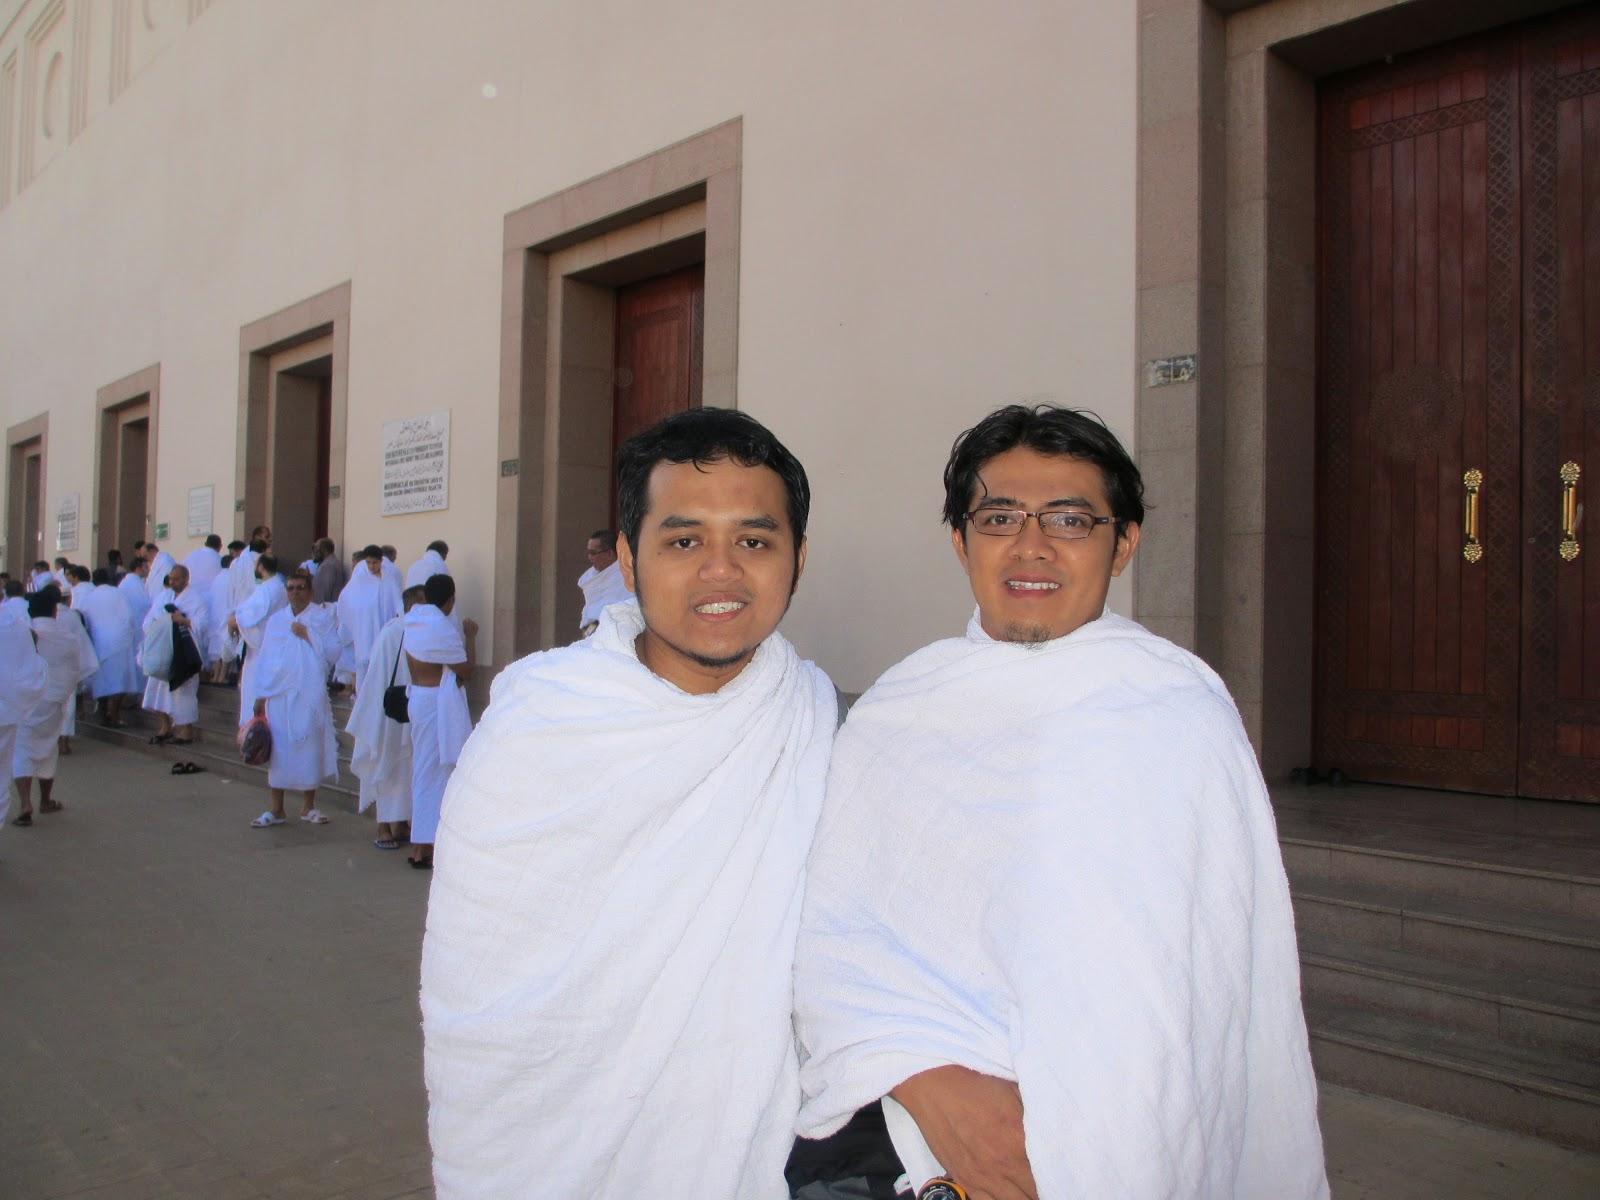 Info Biro Haji dan Umroh Jakarta Nyaman, Bagus, dan Terpercaya